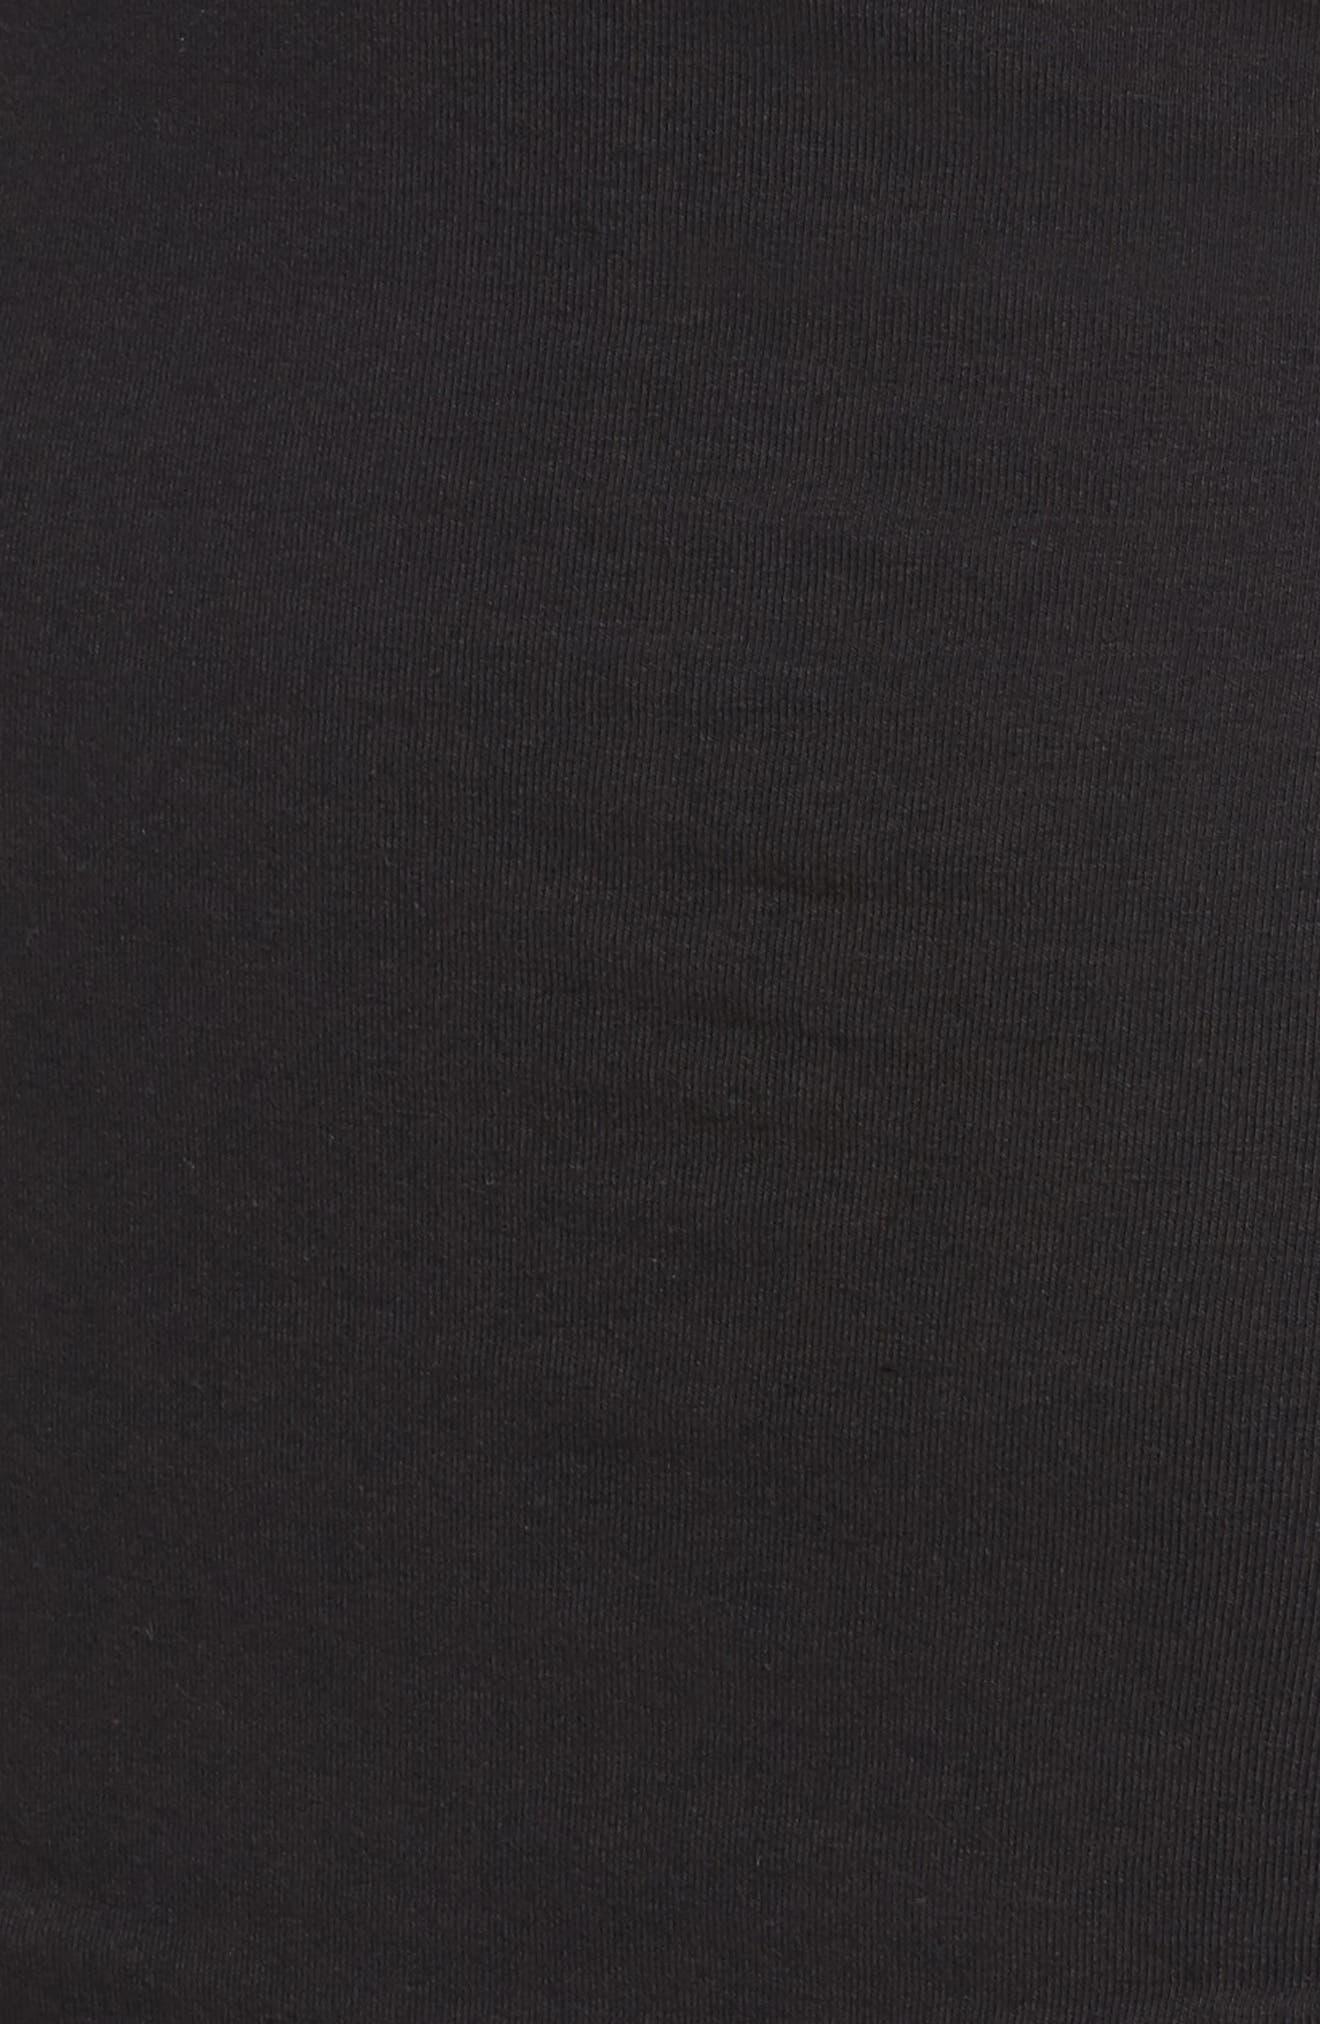 Cold Shoulder Body-Con Dress,                             Alternate thumbnail 5, color,                             Black